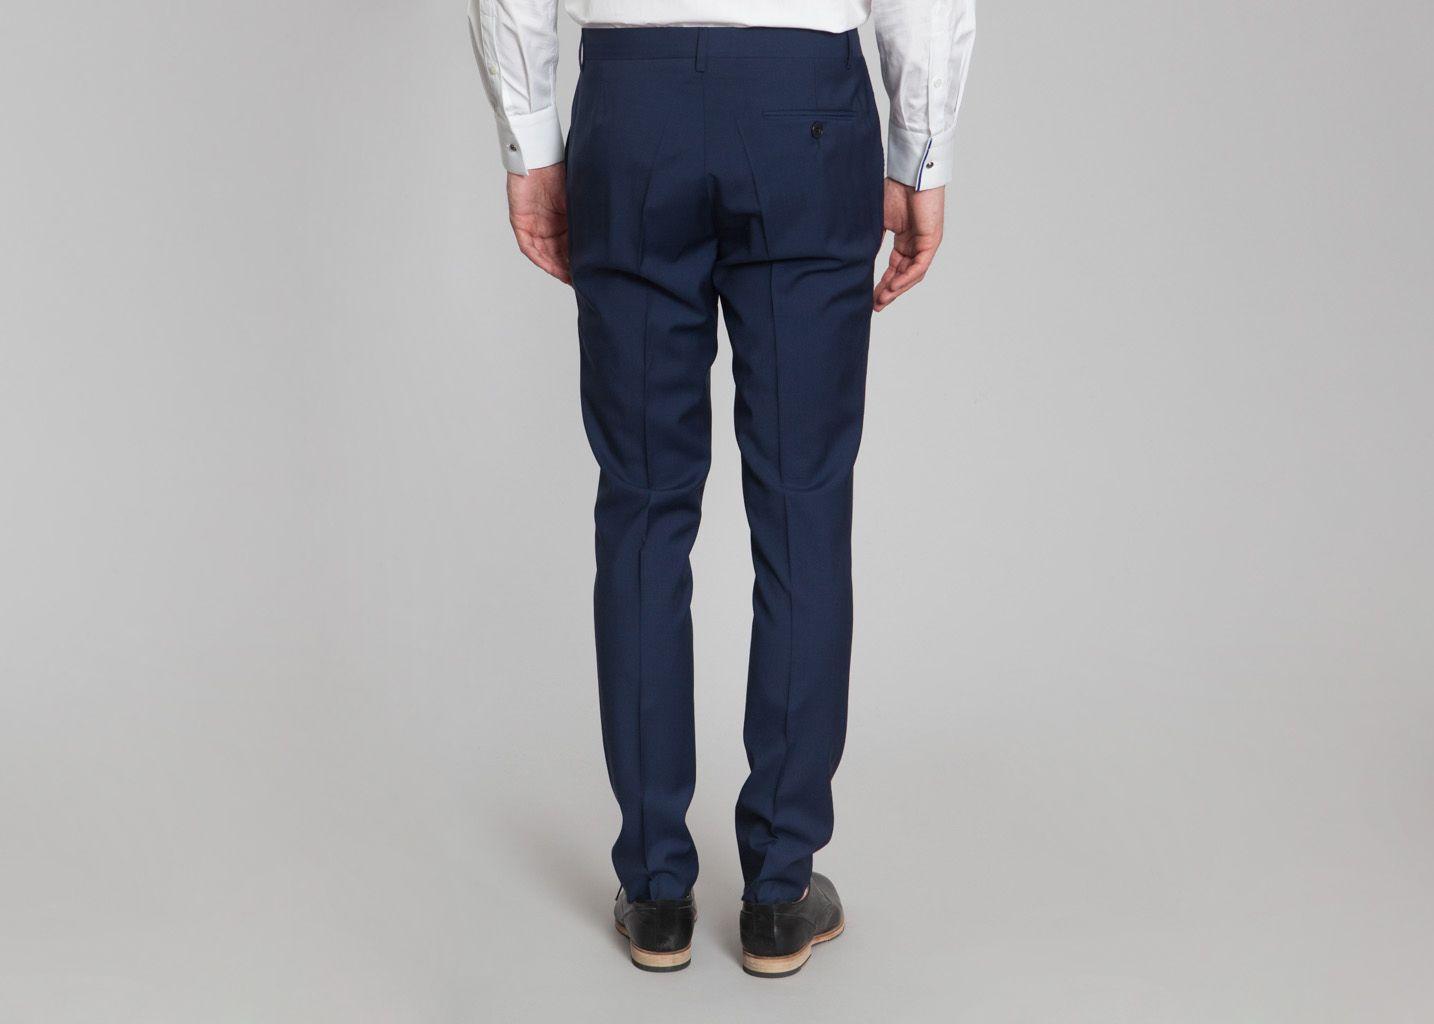 Pantalon Dialogue - Études